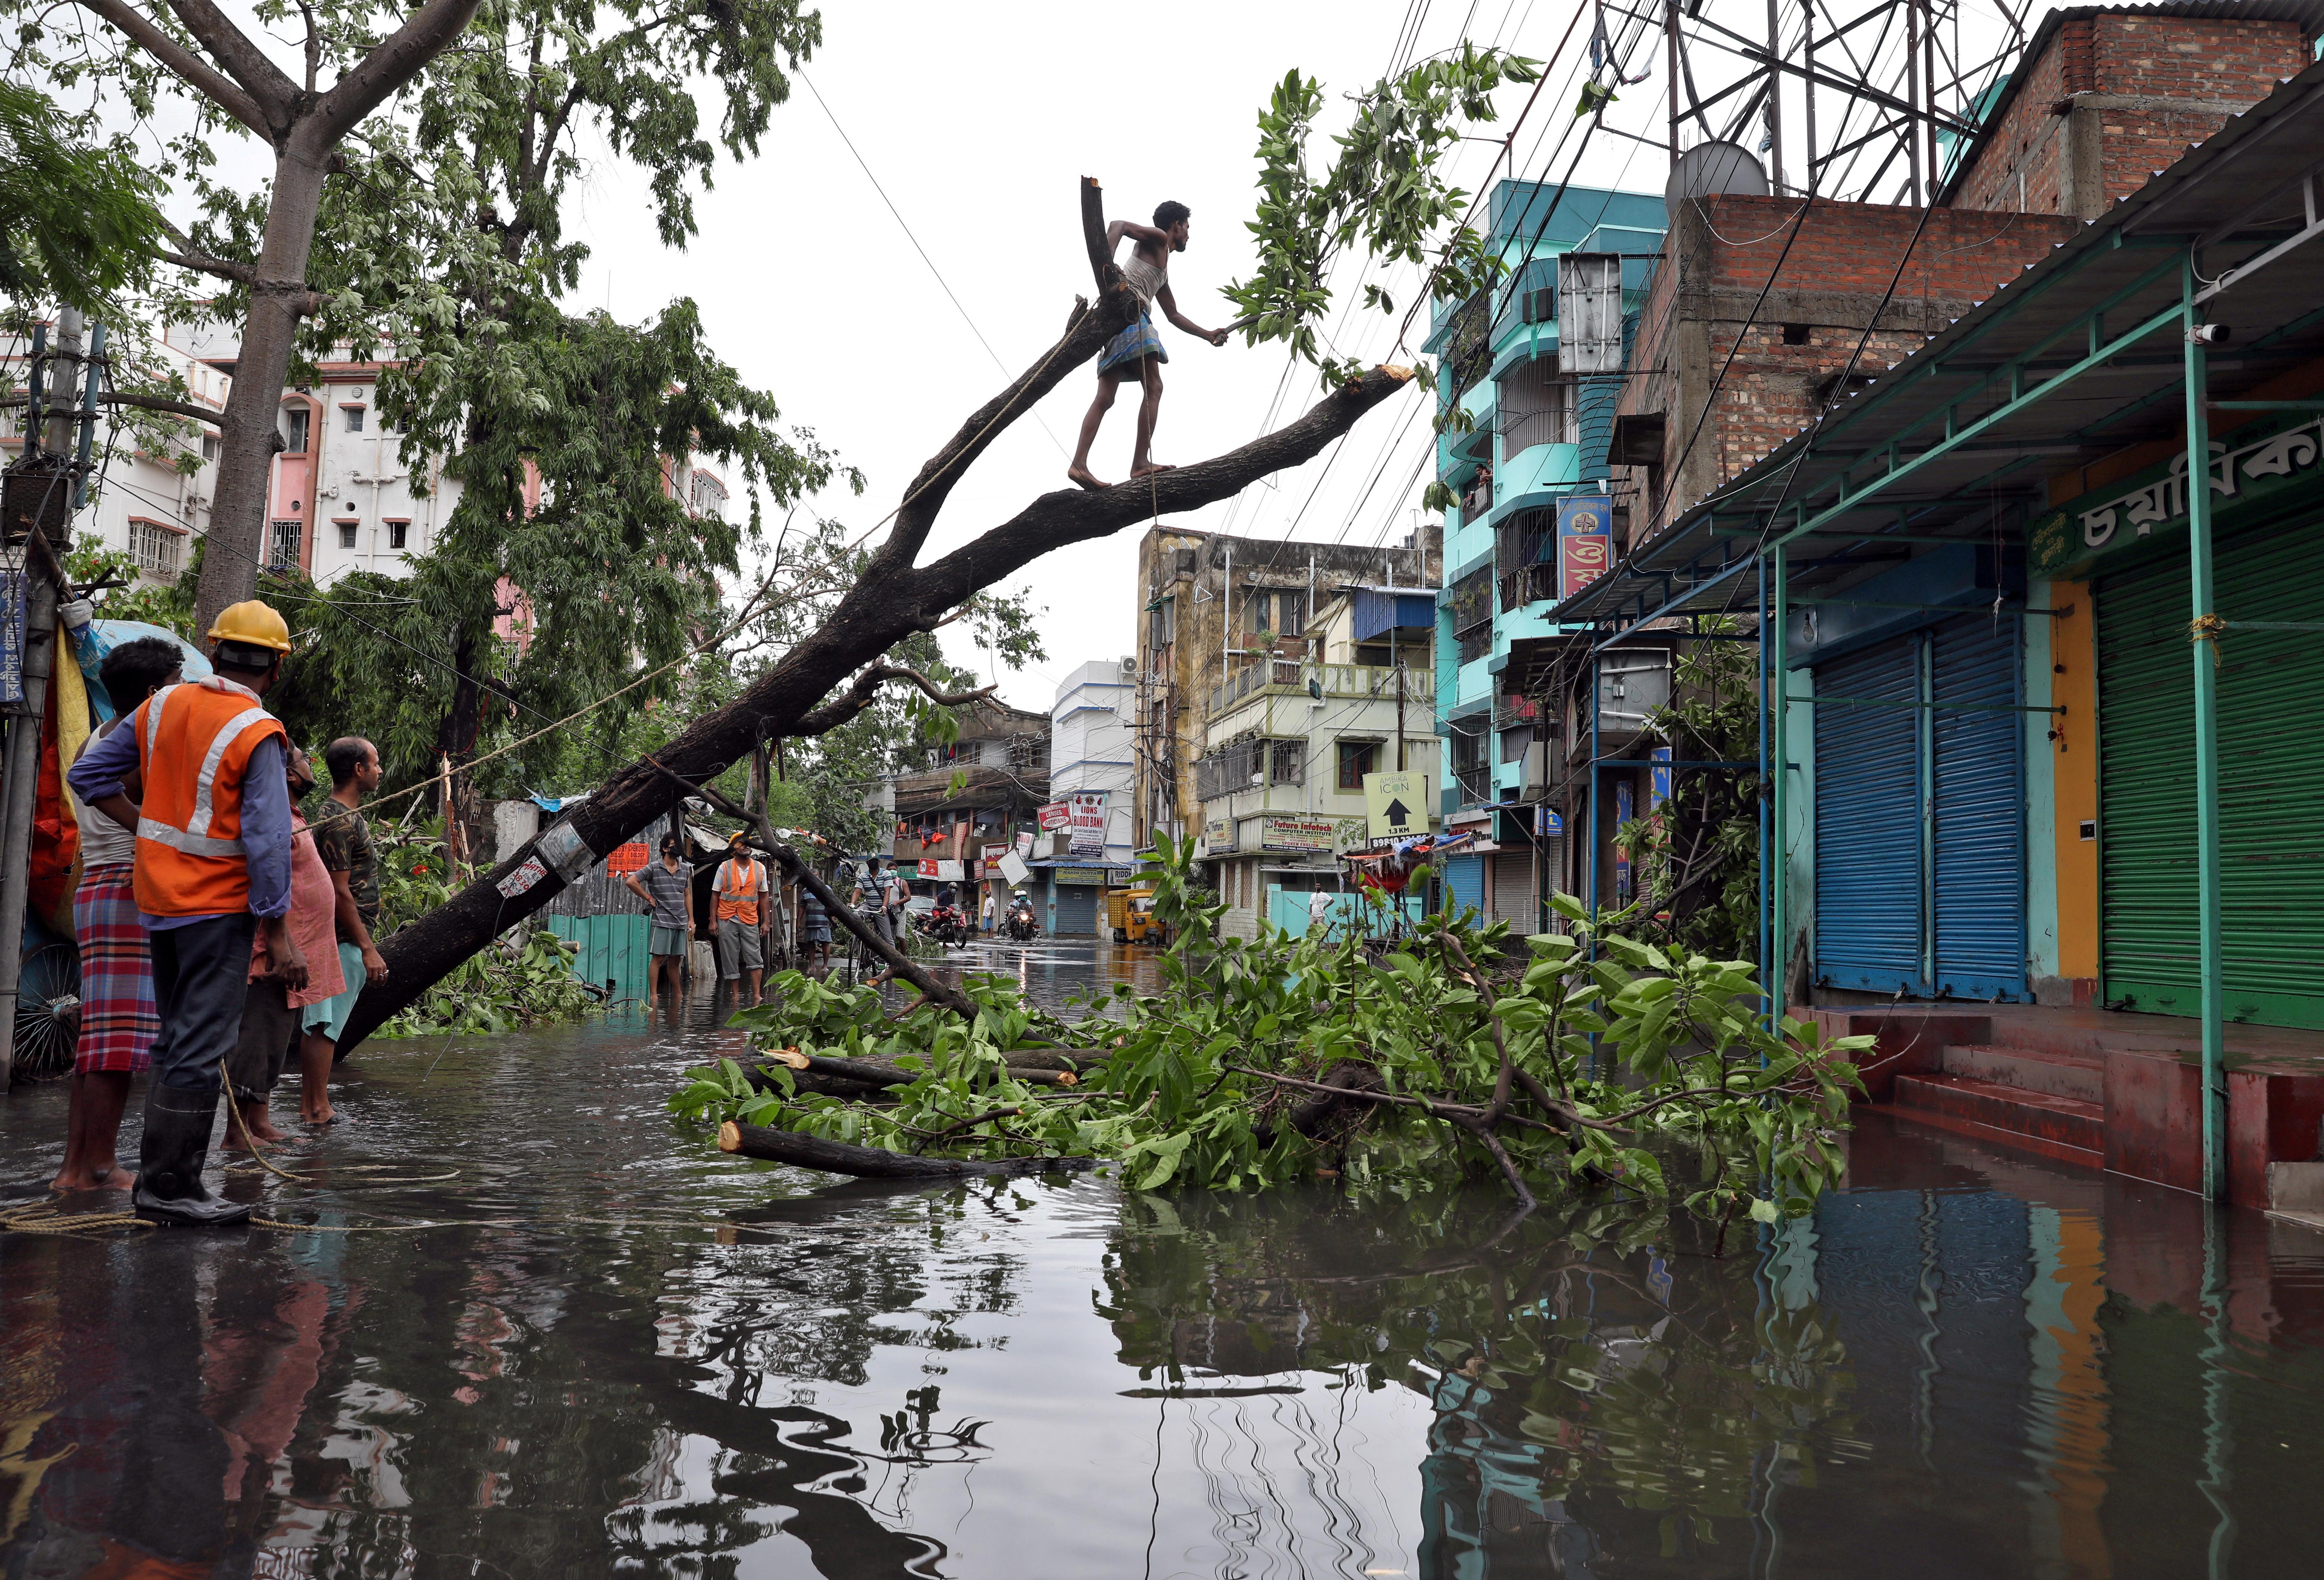 A man cuts branches of an uprooted tree after Cyclone Amphan made its landfall, in Kolkata, India, May 21, 2020. REUTERS/Rupak De Chowdhuri/Files